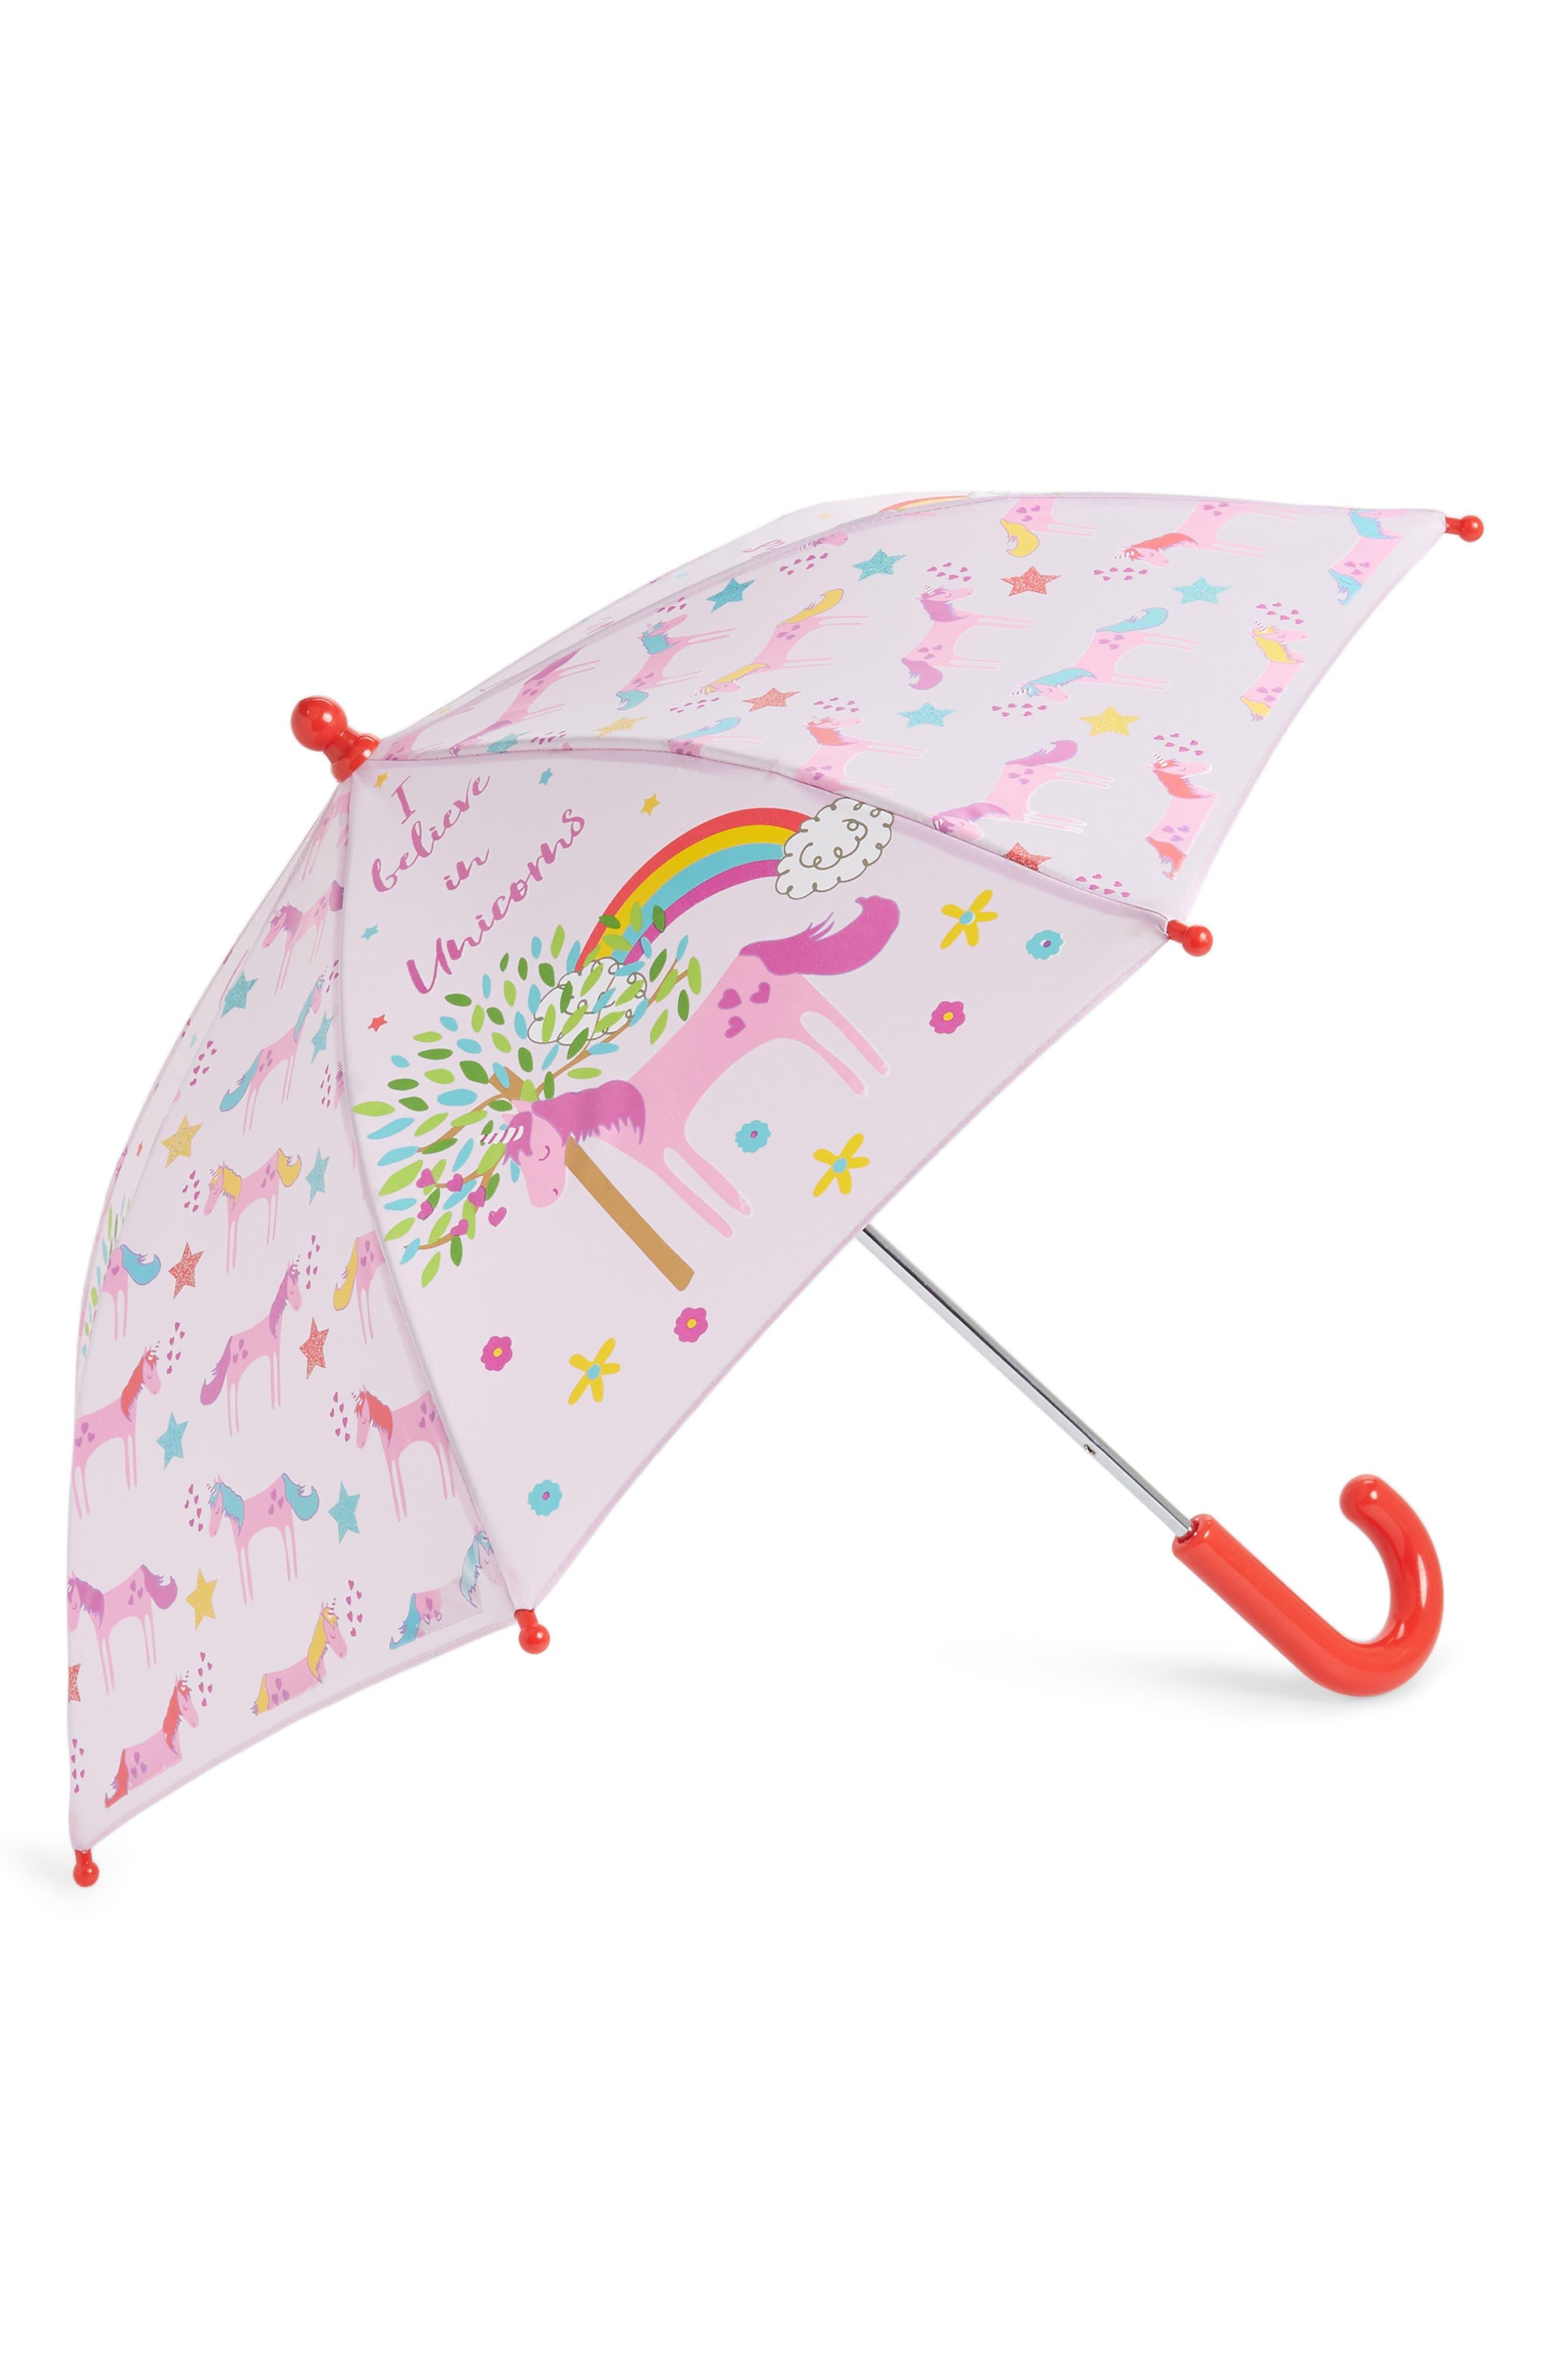 Floss & Rock Unicorn Color Changing Umbrella,                             Alternate thumbnail 2, color,                             LIGHT PINK